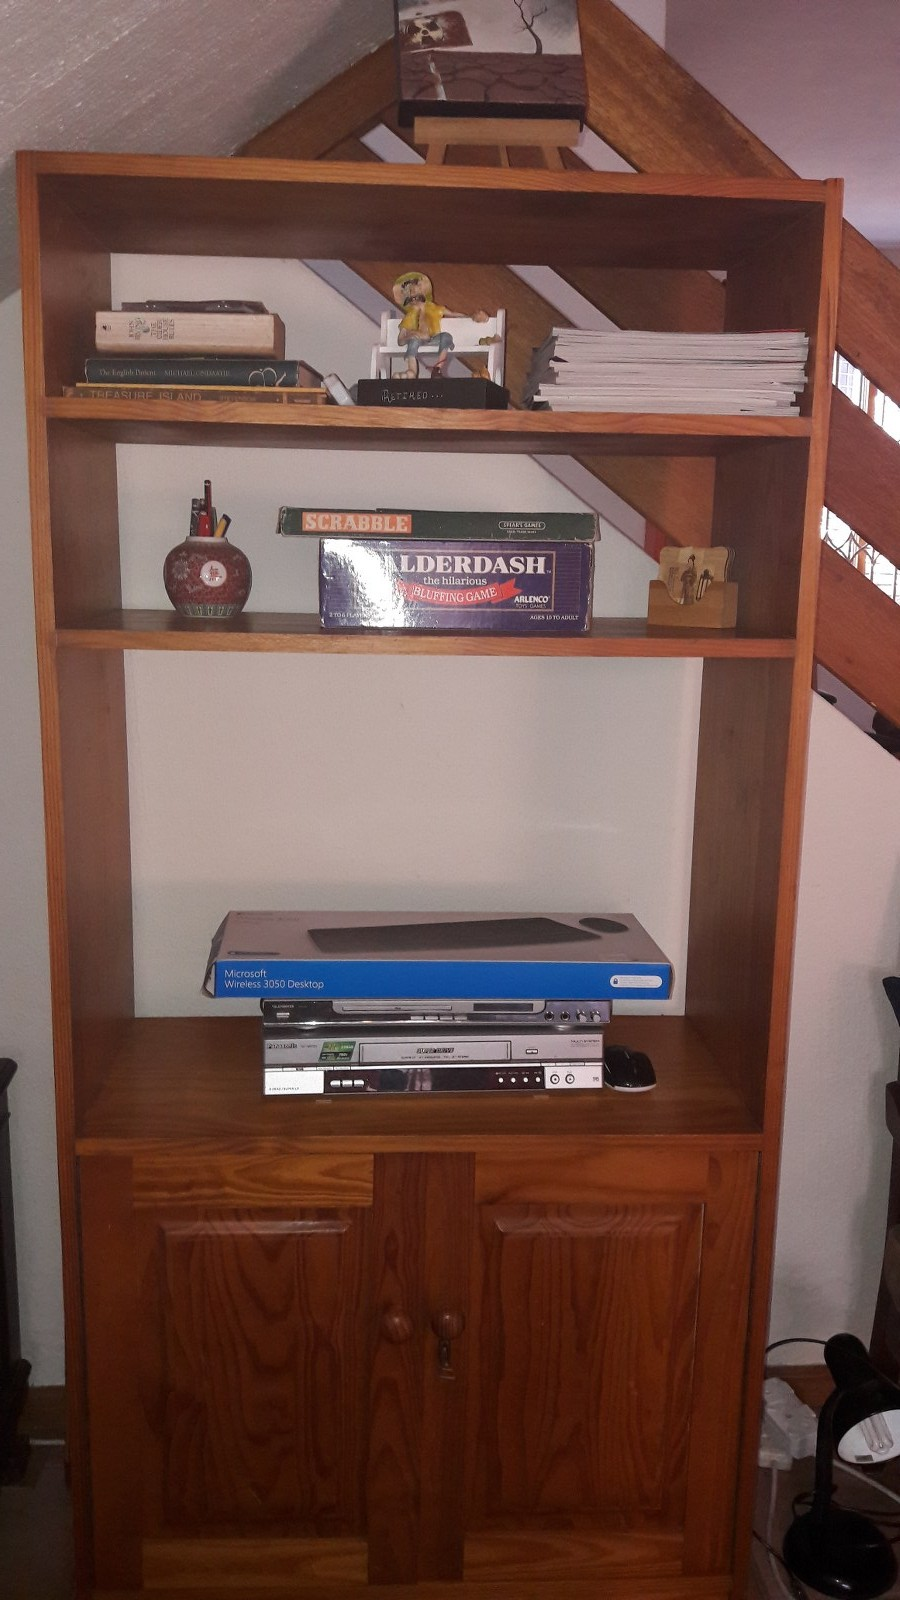 Wooden Cupboard:  bookshelf, entertainment unit,  locked cabinet